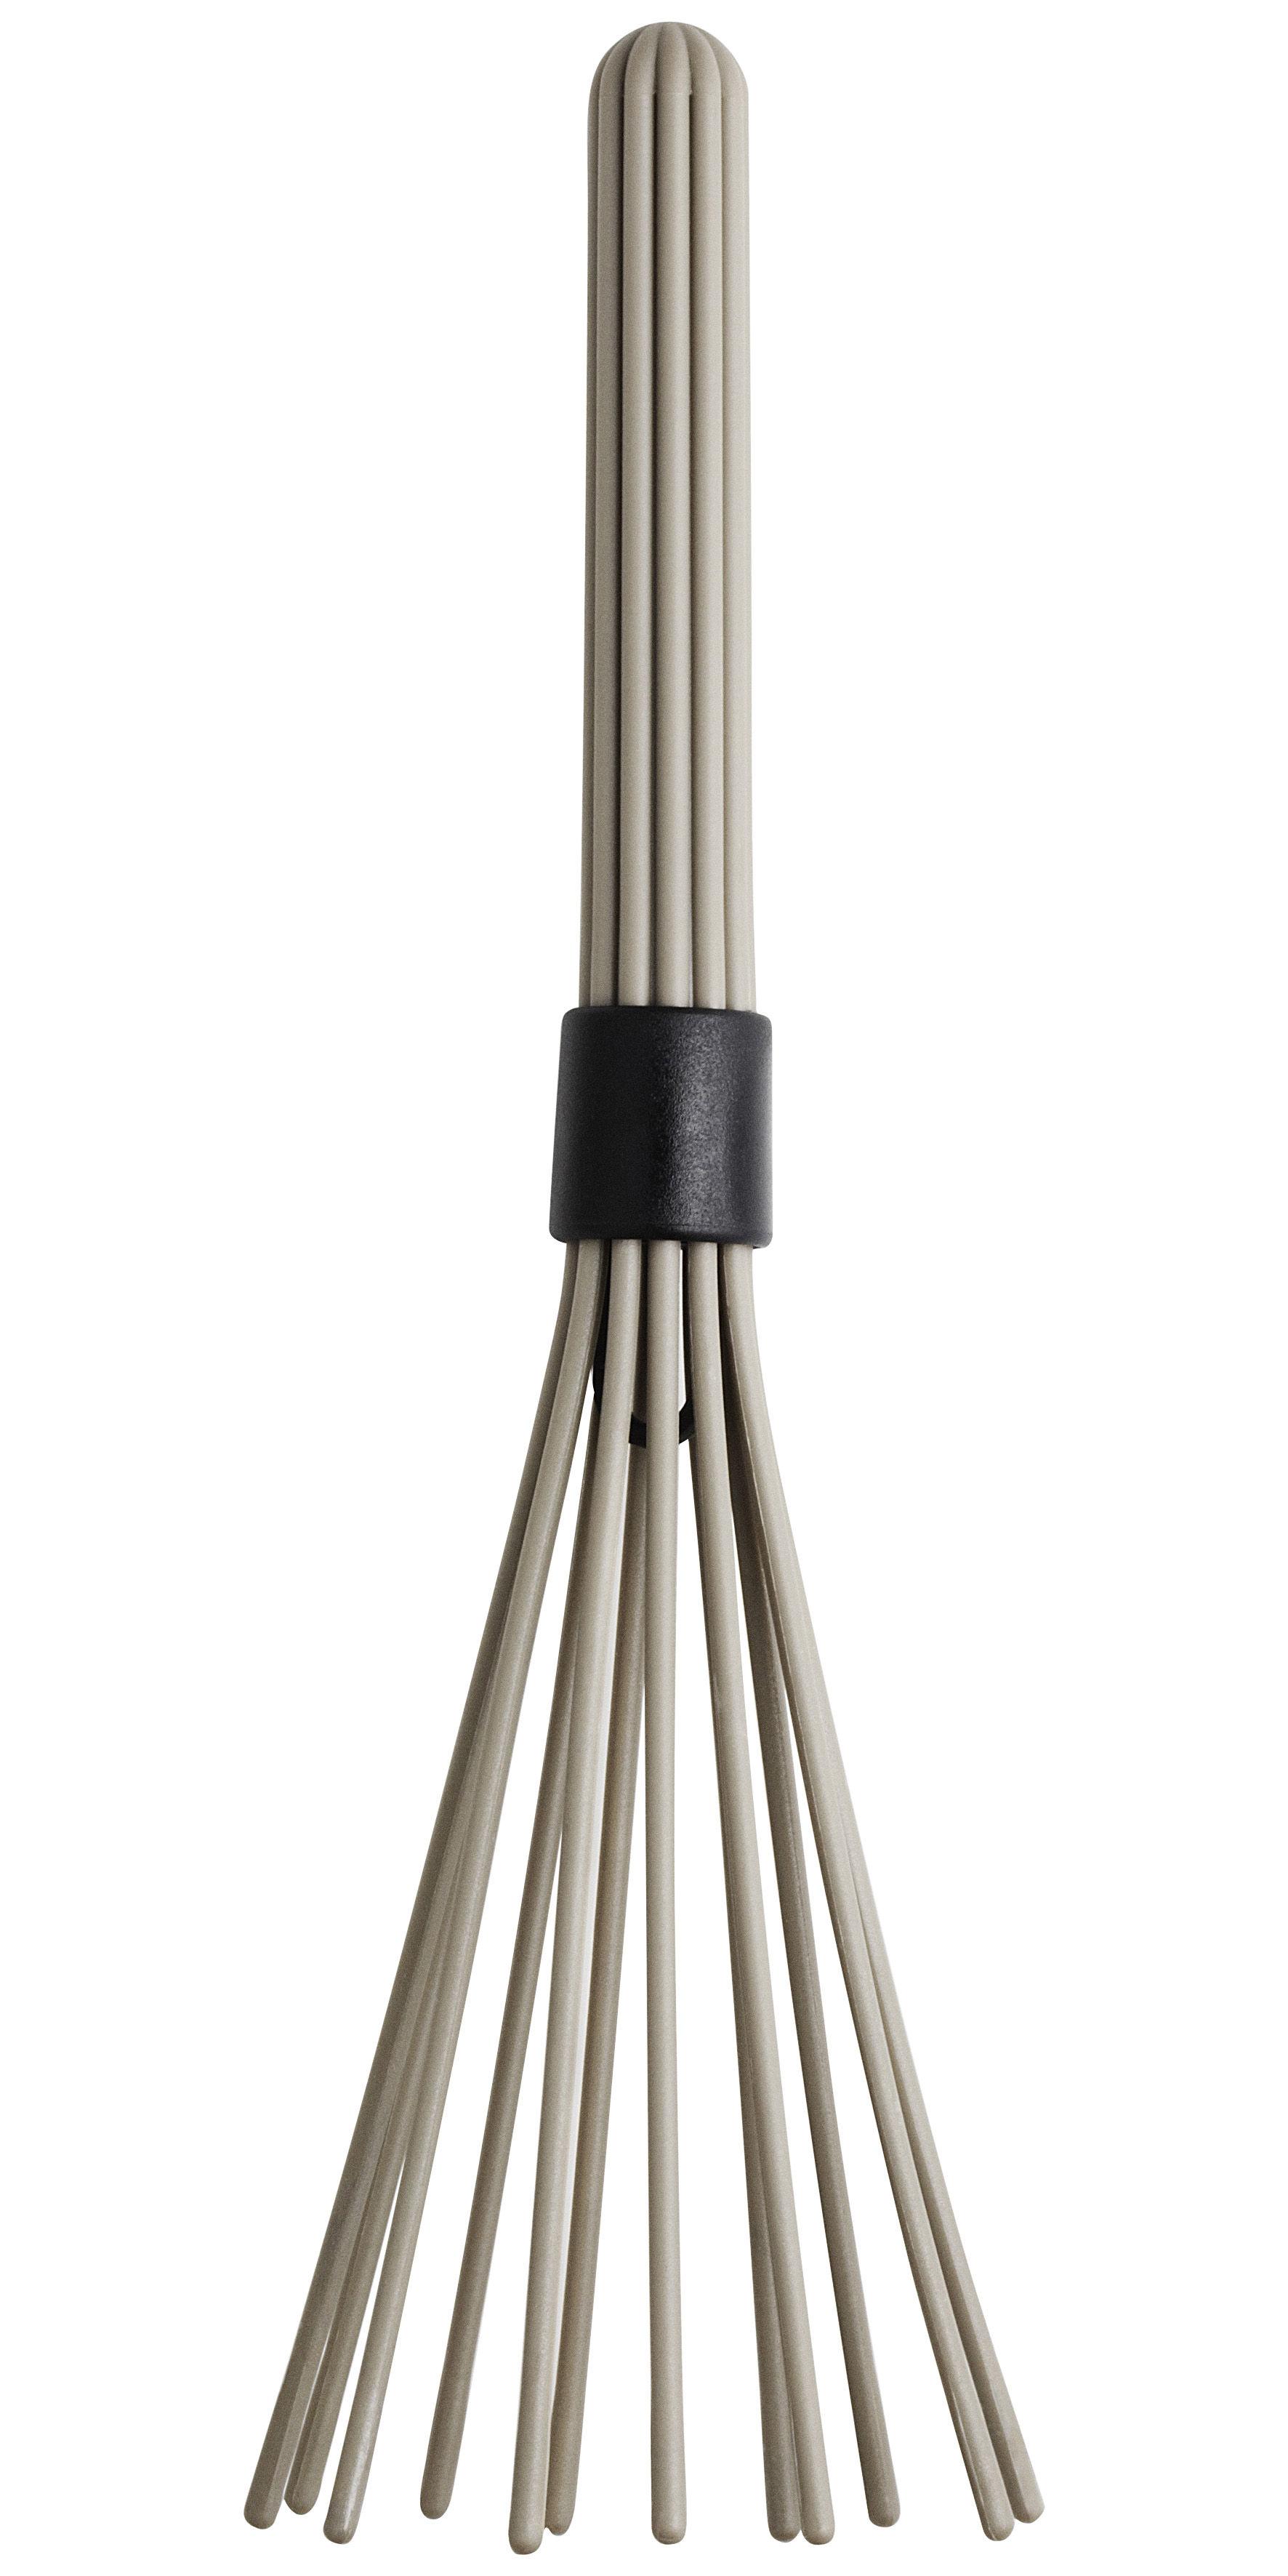 Küche - Küchenutensilien - Beater Schneebesen faltbar - Normann Copenhagen - Grau - Nylon